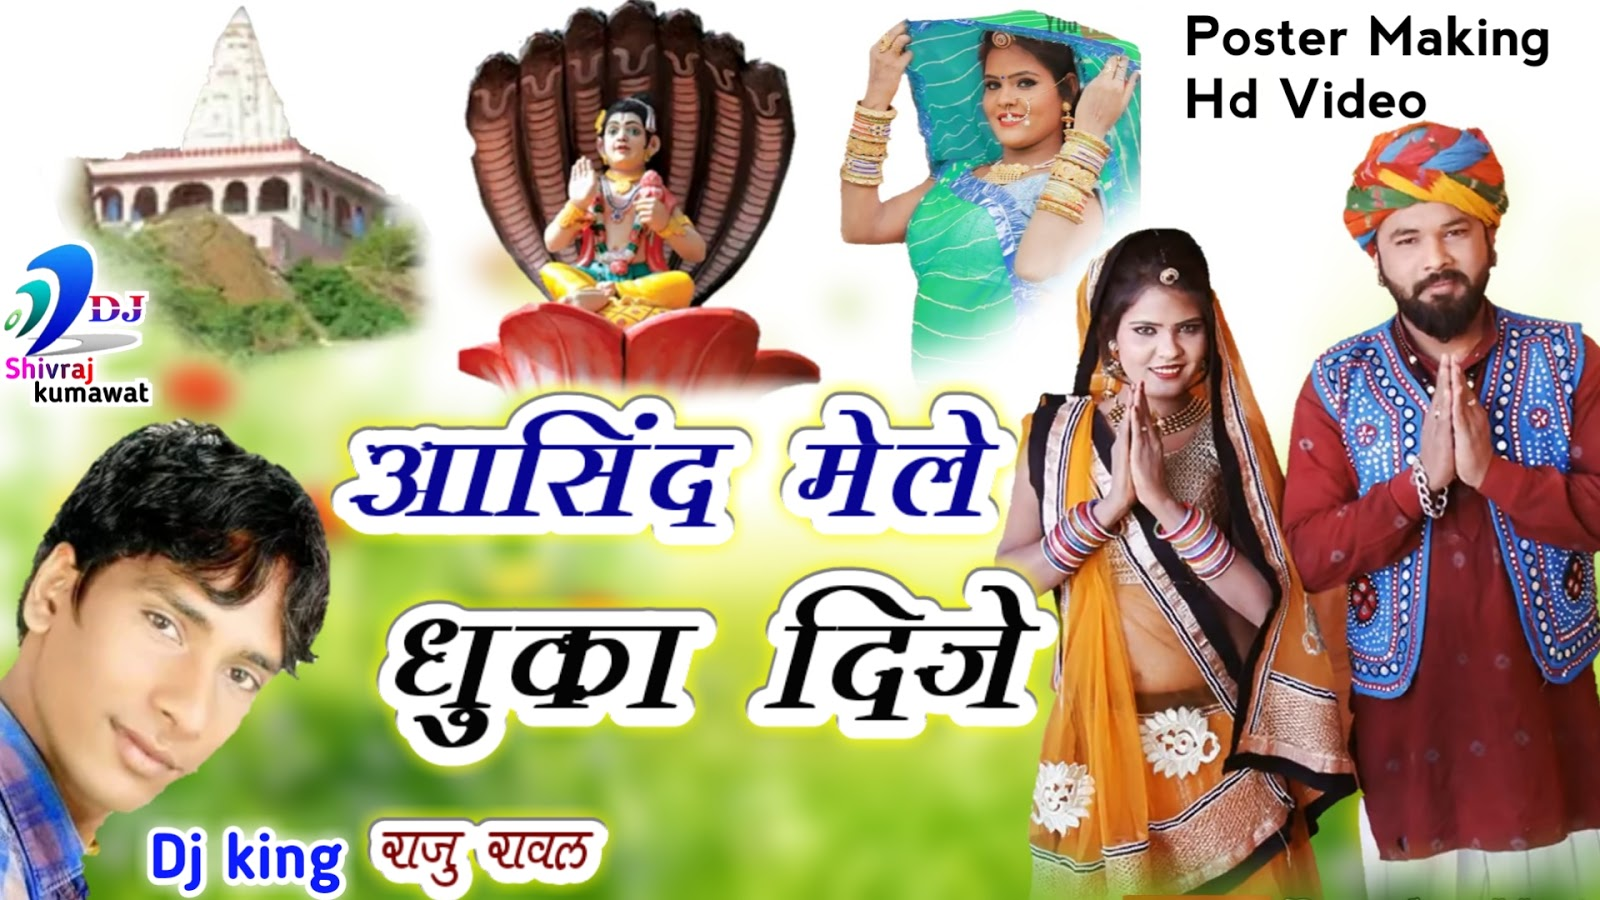 Rajasthani mix : King of Dj Raju Rawal, Asind mele dhuka